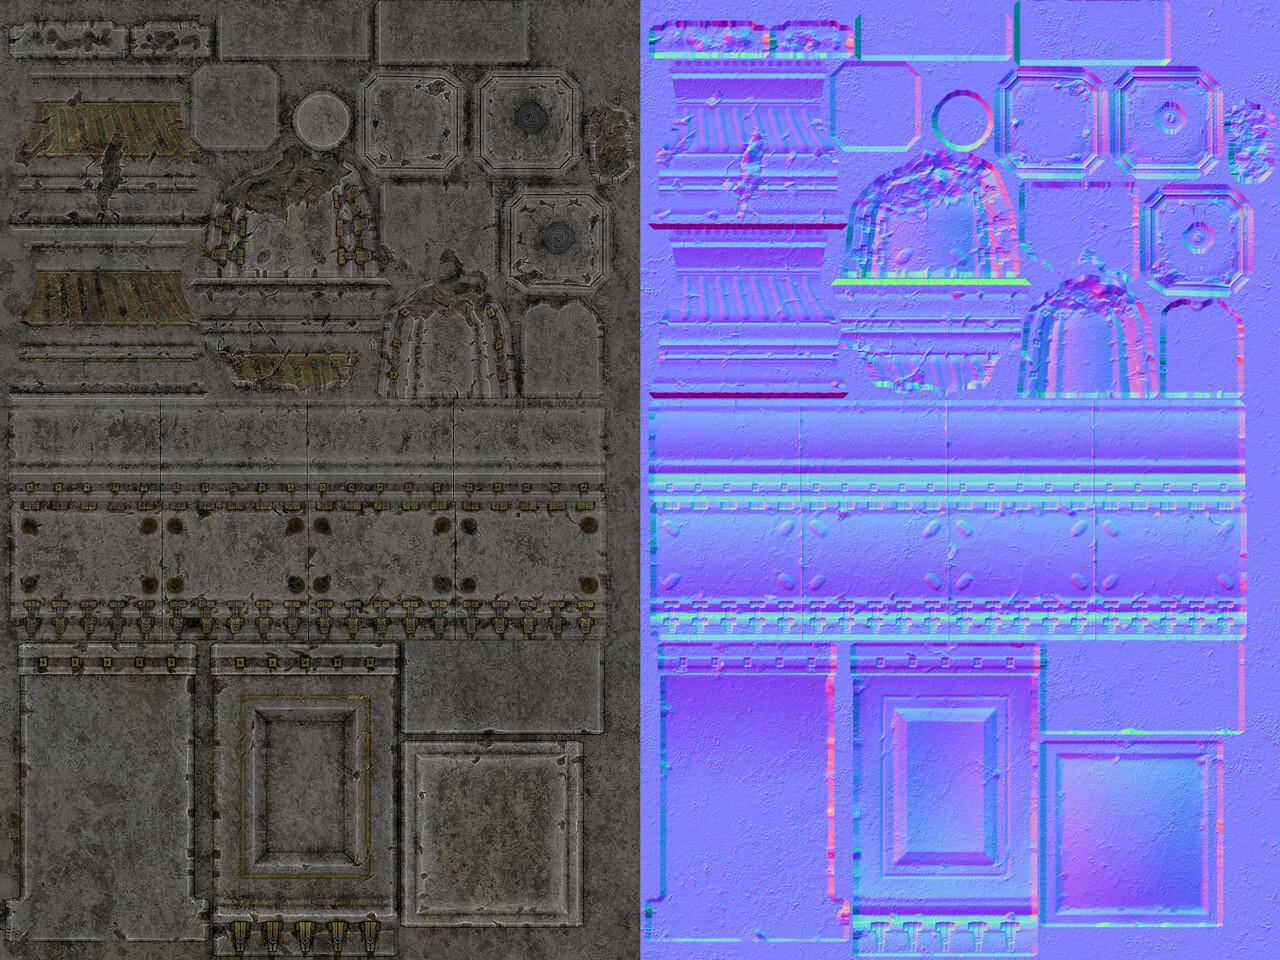 Textures - 1x 1024x1024 1x 1024x512 (diffuse, normal)